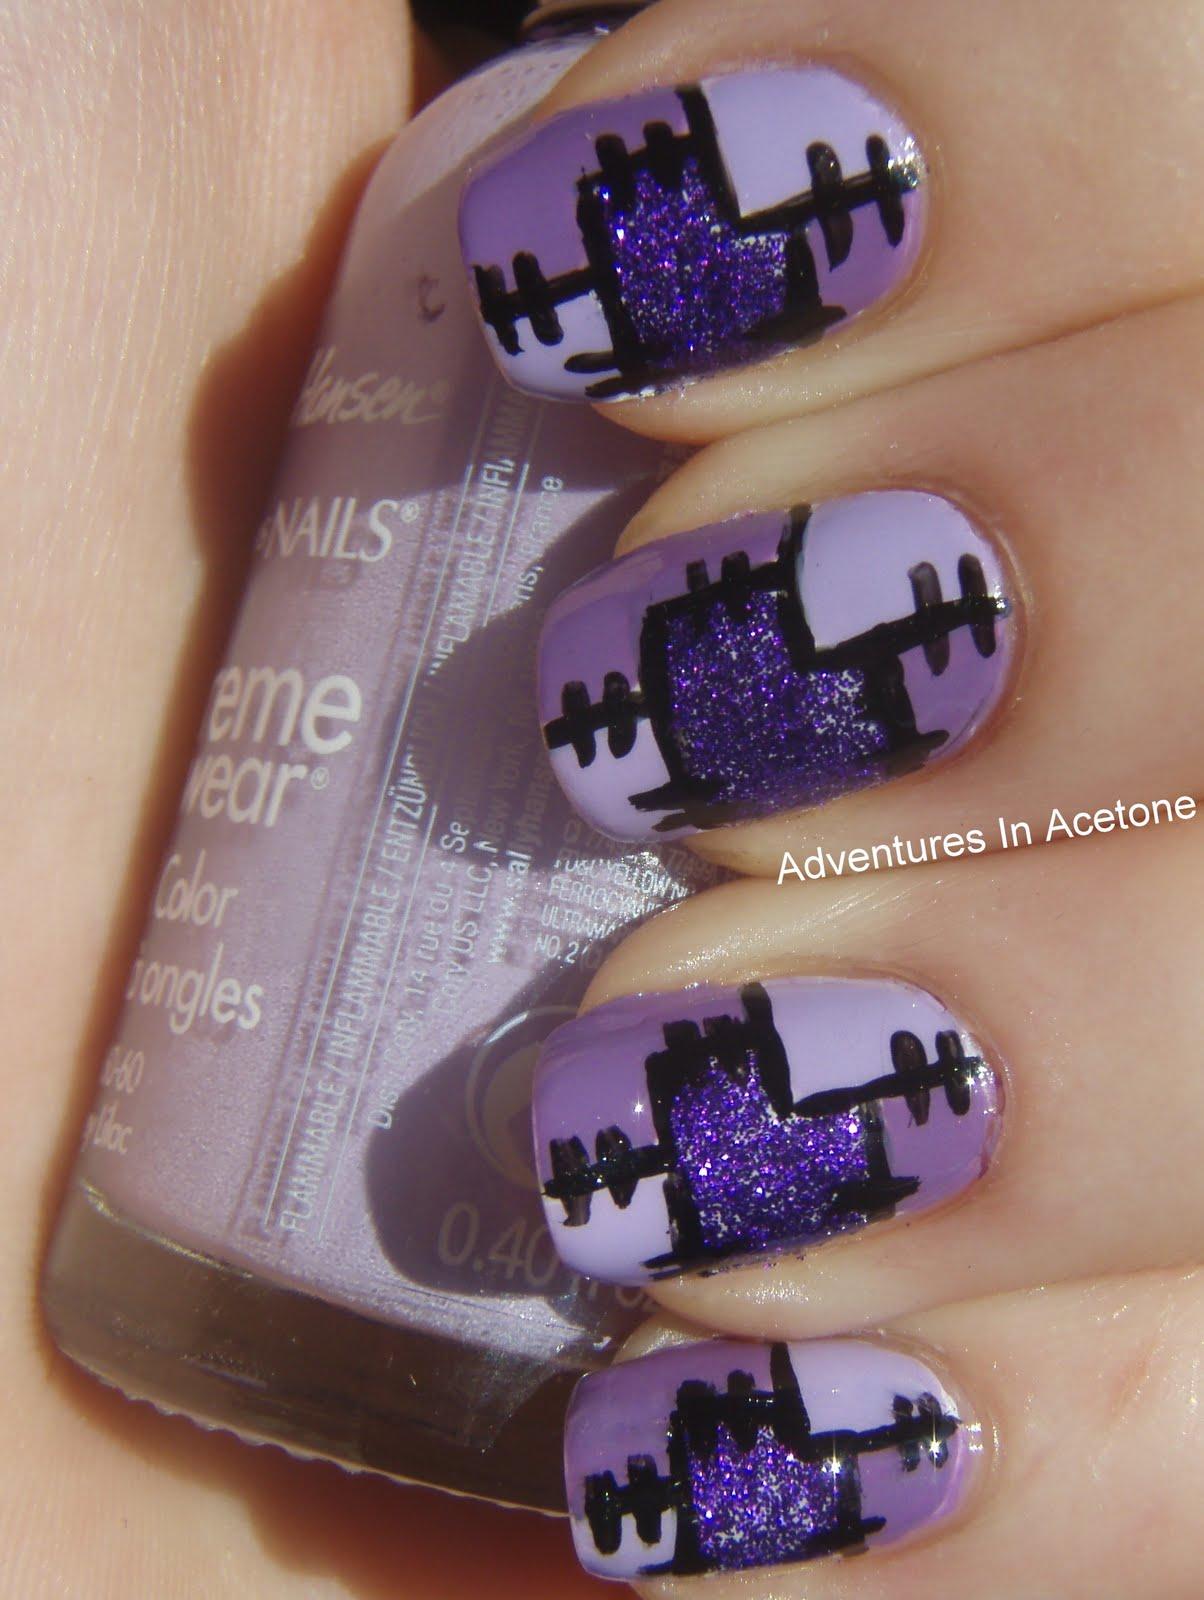 Nail art color violet - I Used Base Coat Opi Nail Envy Essie Blanc For The First Color Coat Striper Brush And Wet N Wild Black Creme For The Lines Nubar Violet Sparkle